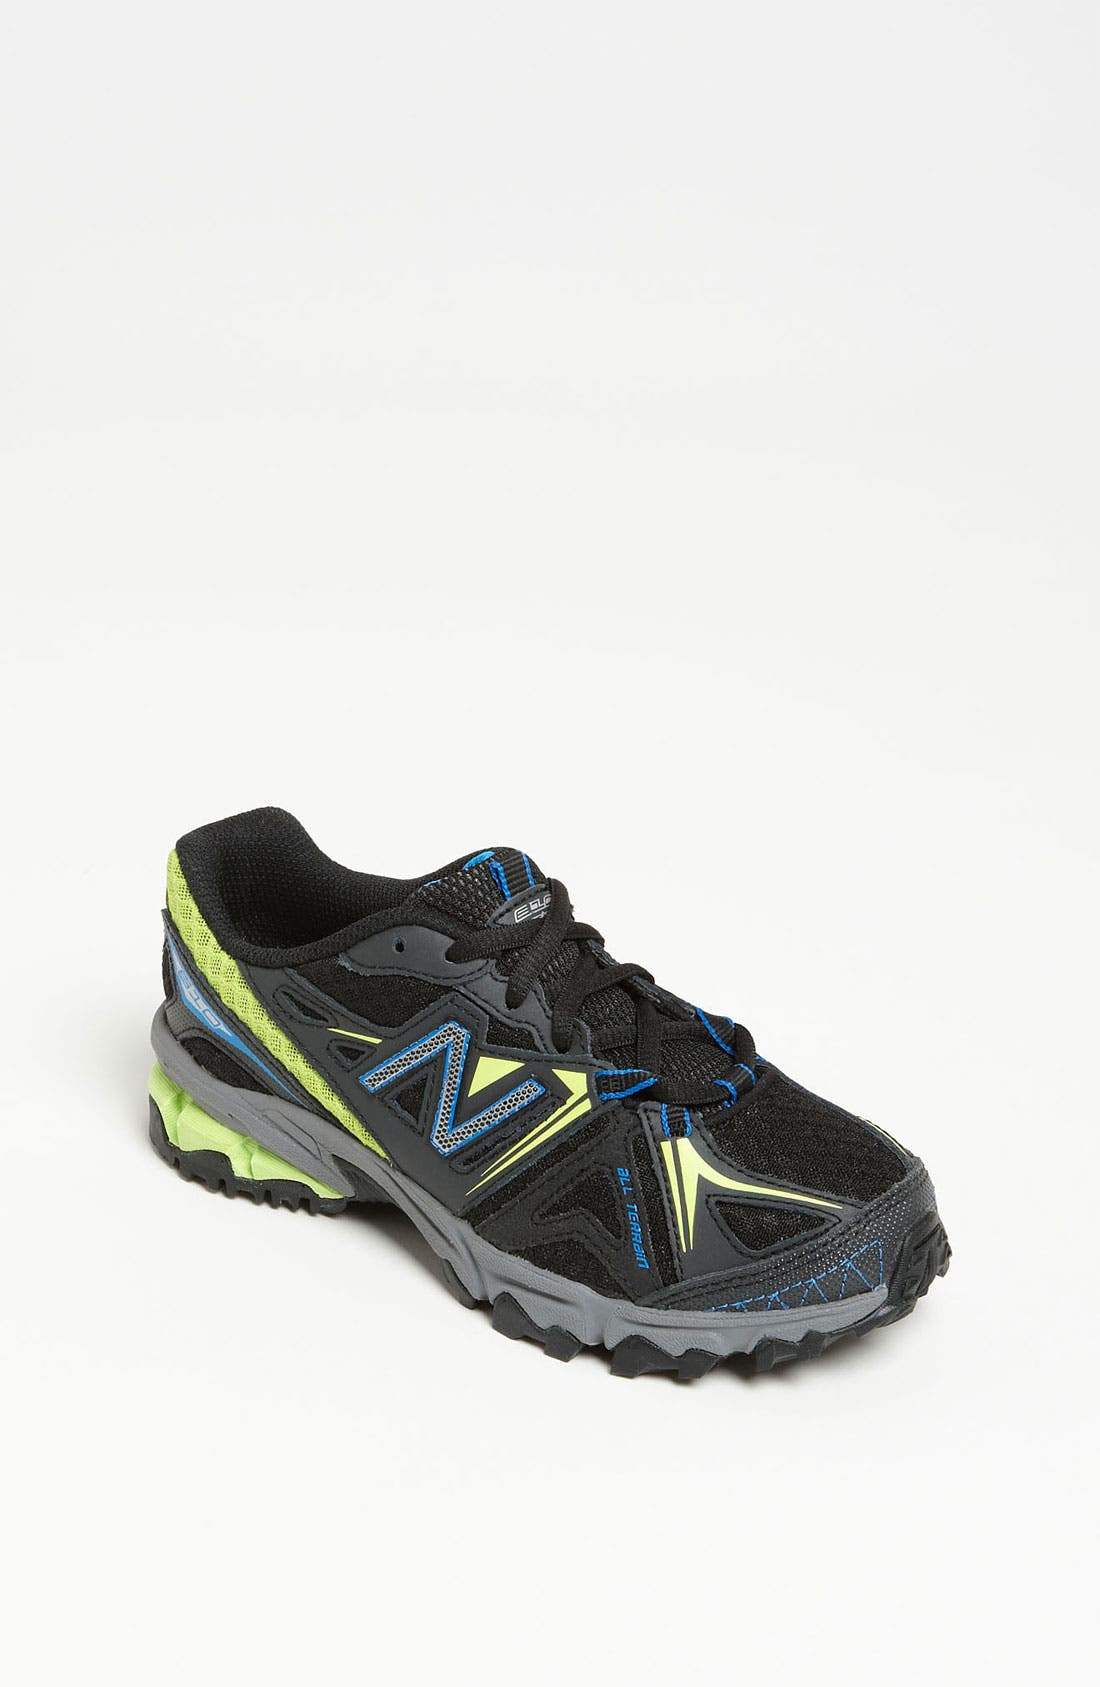 Alternate Image 1 Selected - New Balance 'Takedown 610' Trail Running Shoe (Toddler, Little Kid & Big Kid)